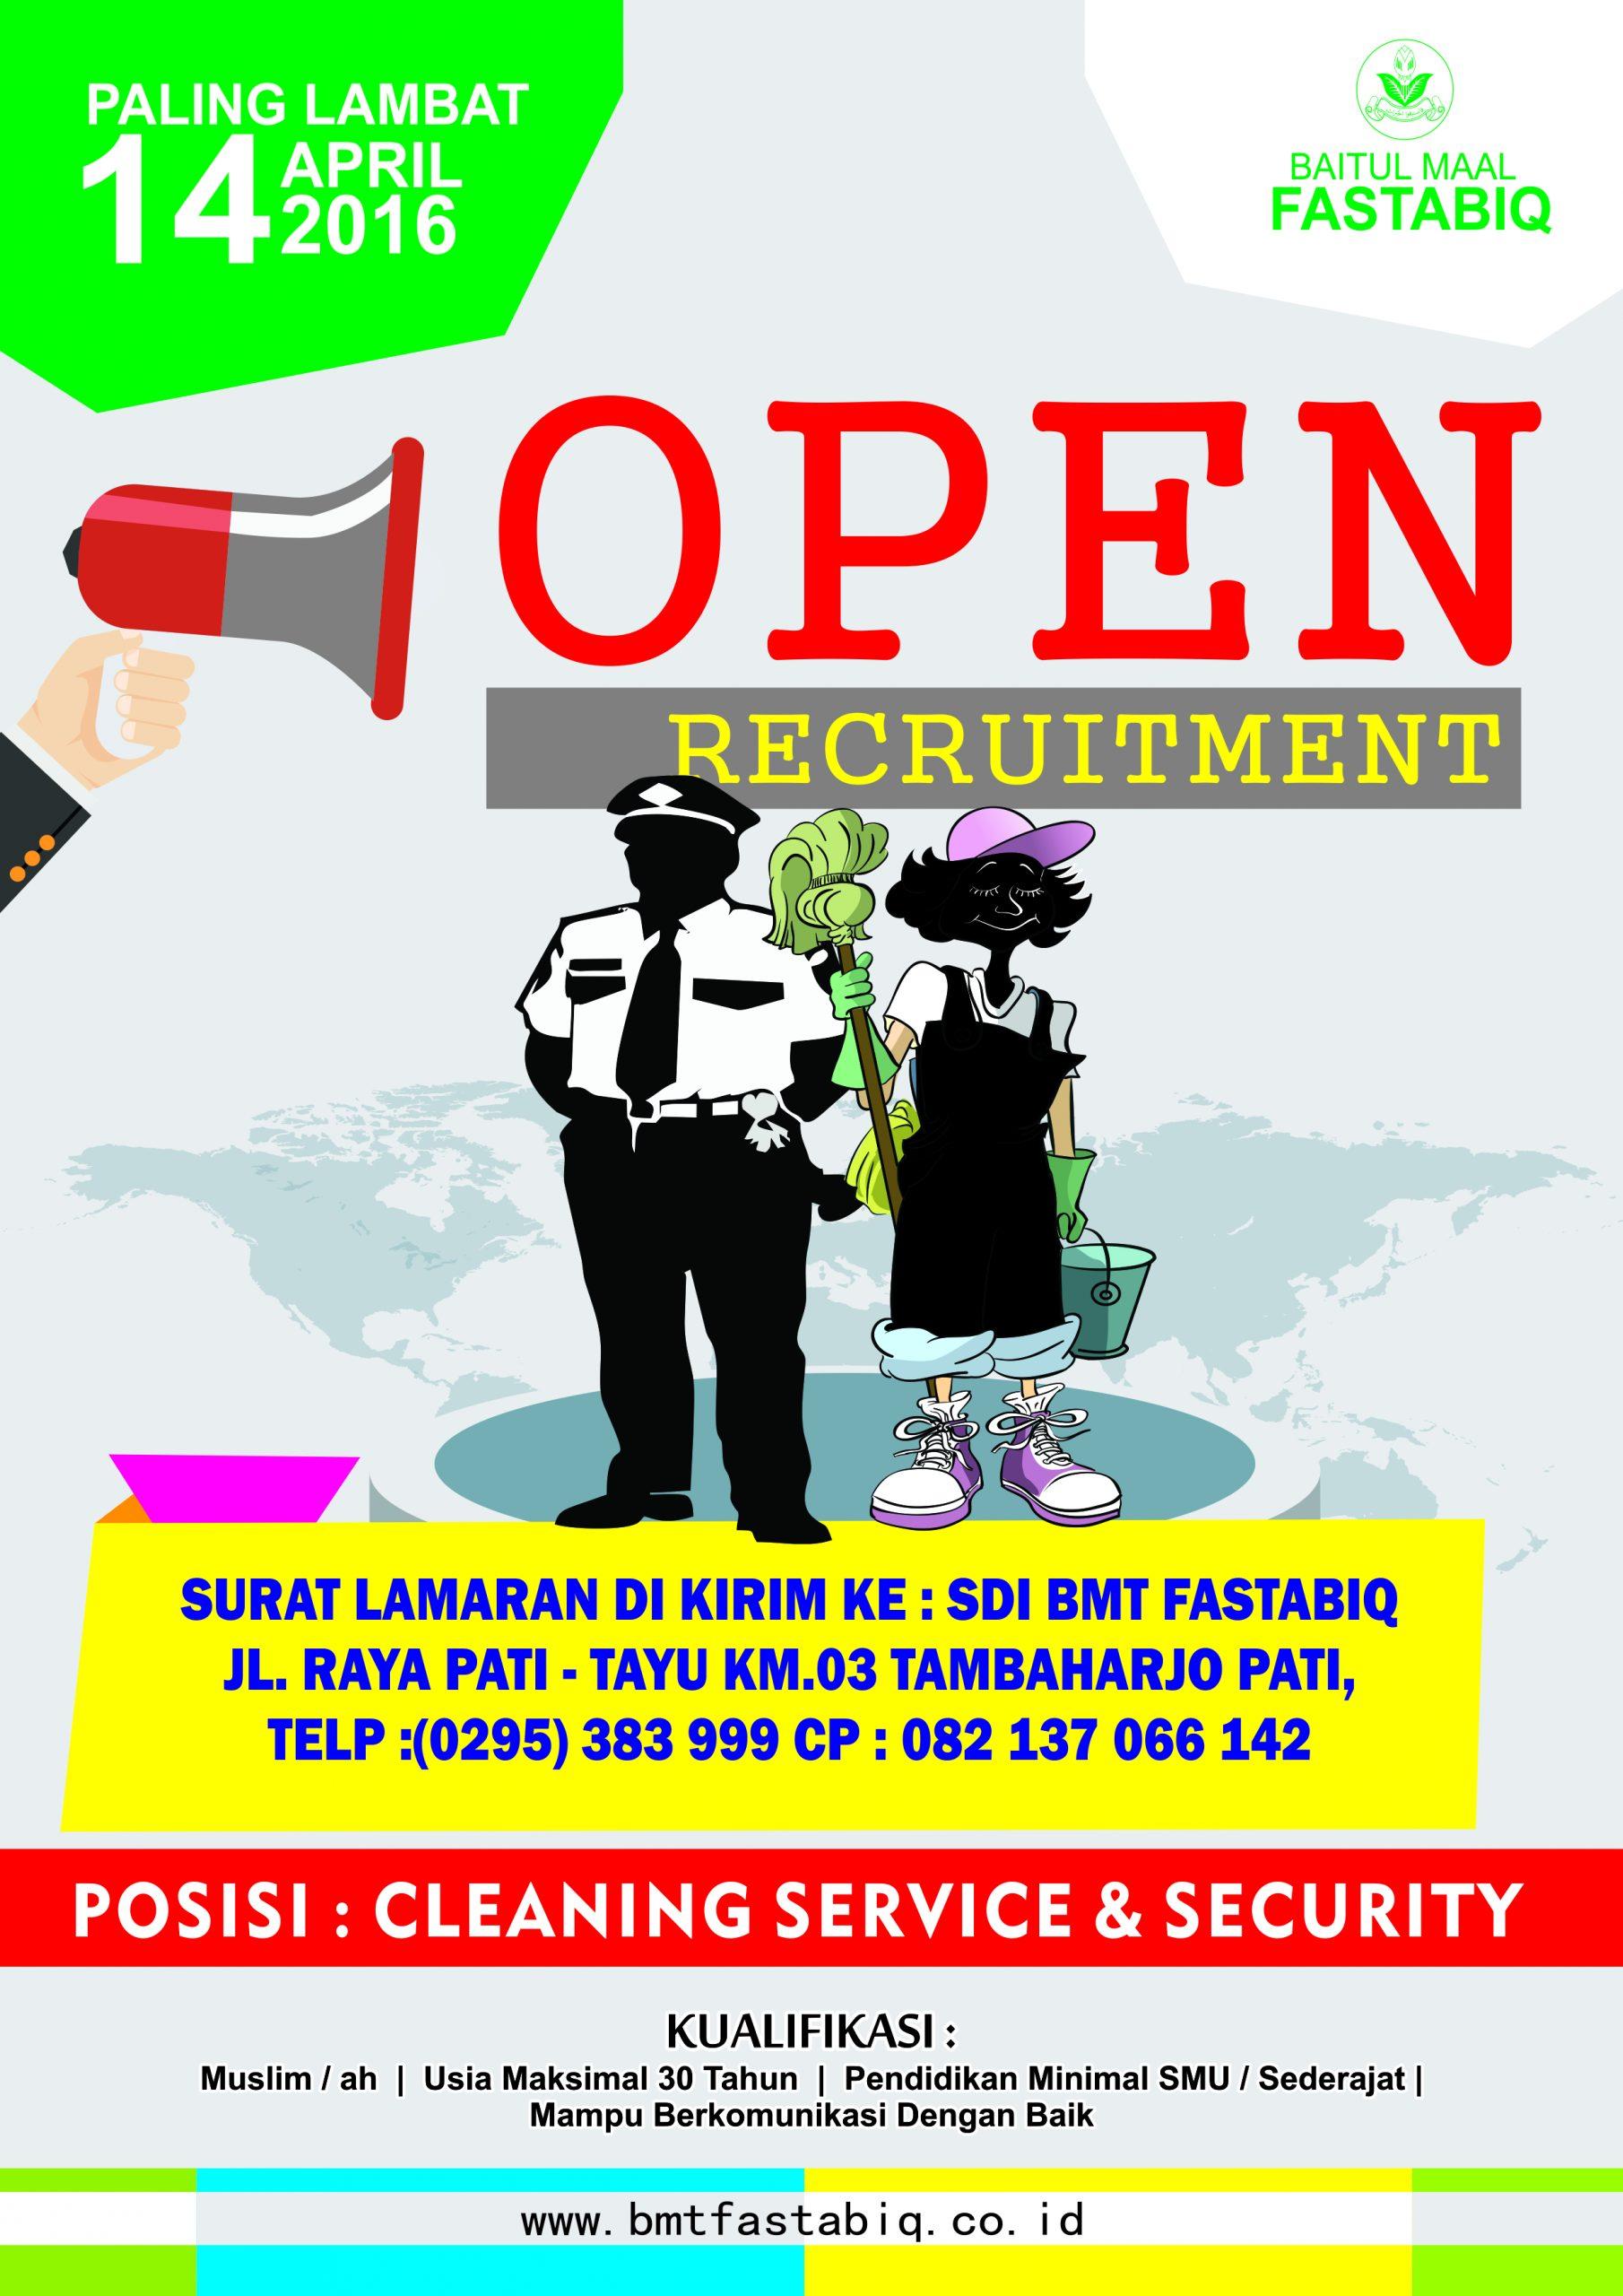 Info Lowongan Kerja Security Dan Cleaning Service Kspps Bmt Fastabiq Pati